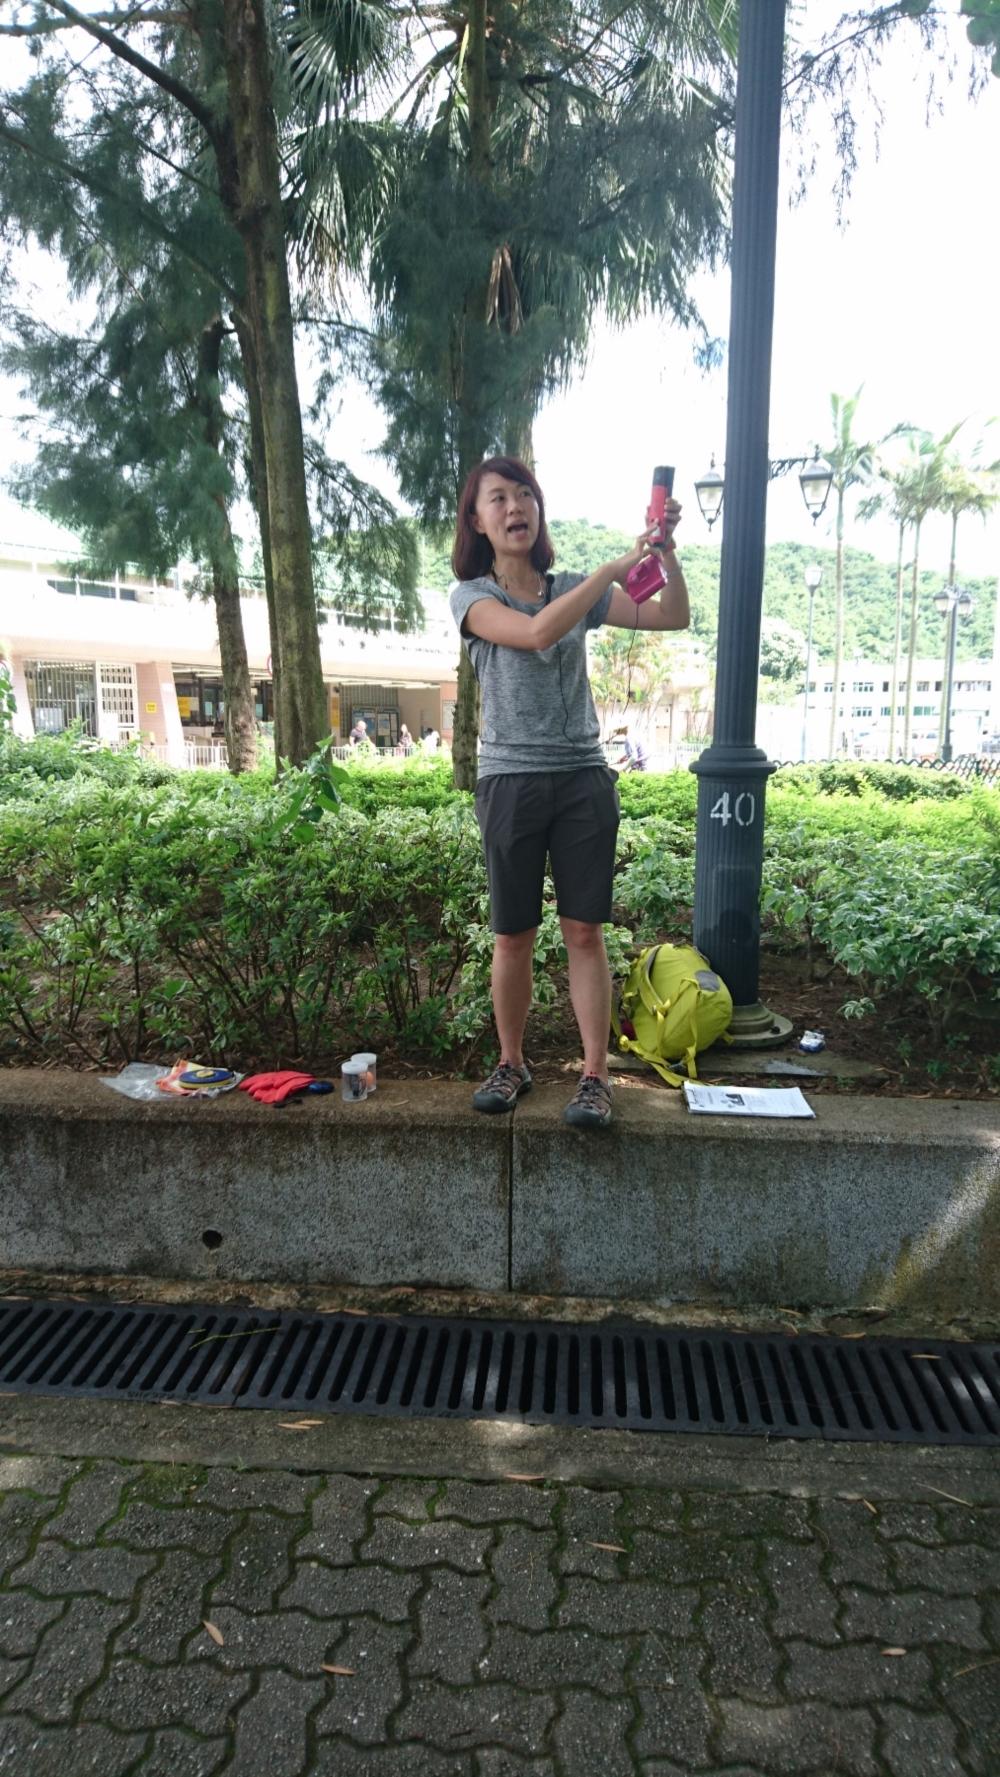 http://www.npc.edu.hk/sites/default/files/4_1036.jpg